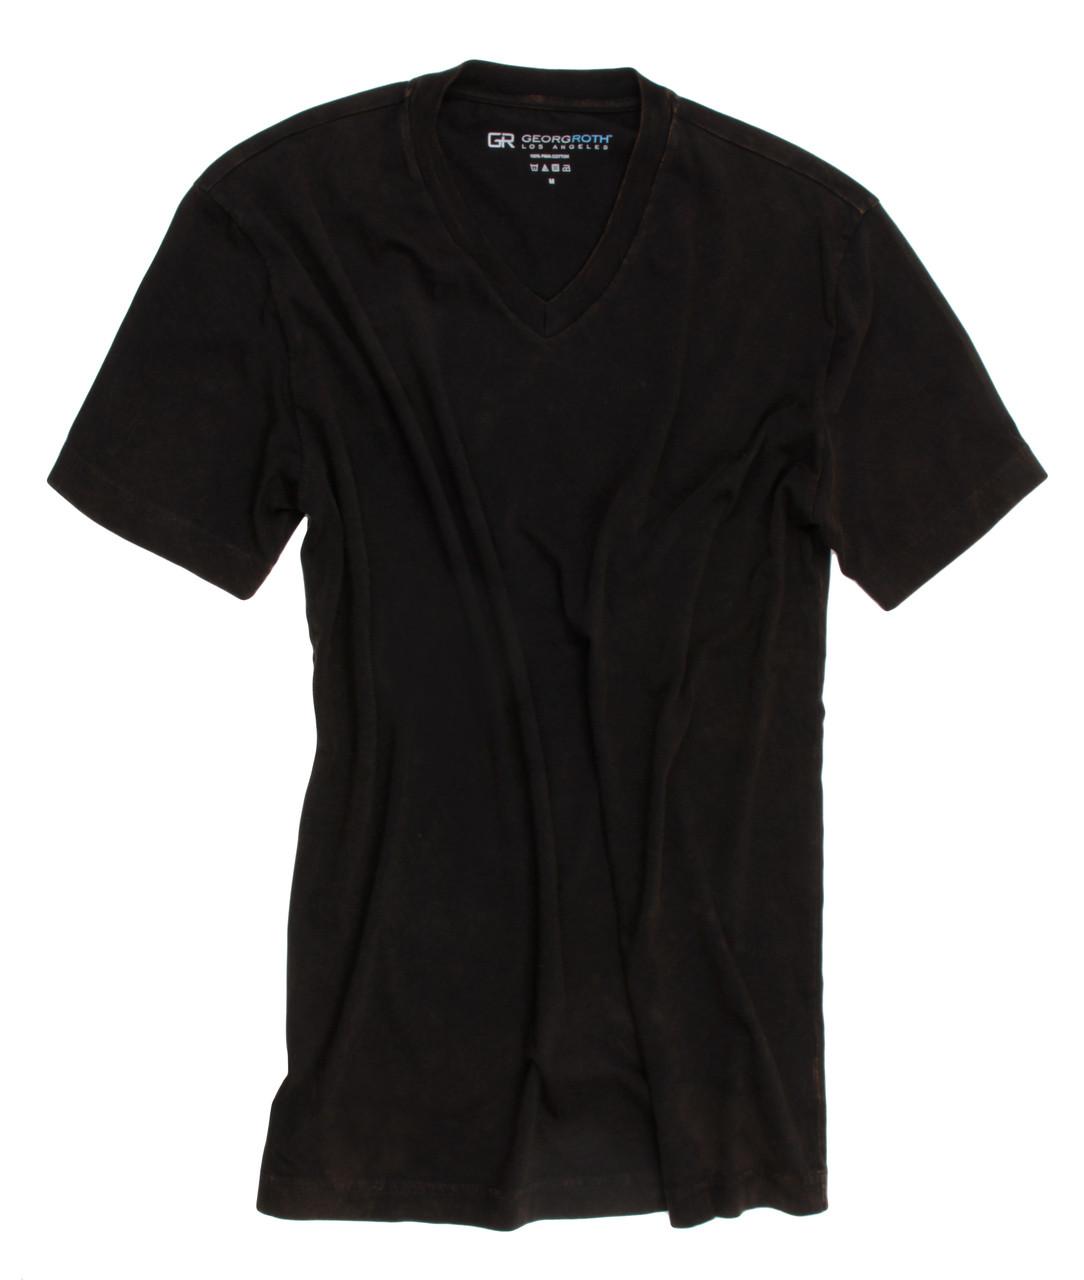 c1db340f1fa The World s Greatest V-Neck T-shirt Black Vintage Washed Short Sleeves V-